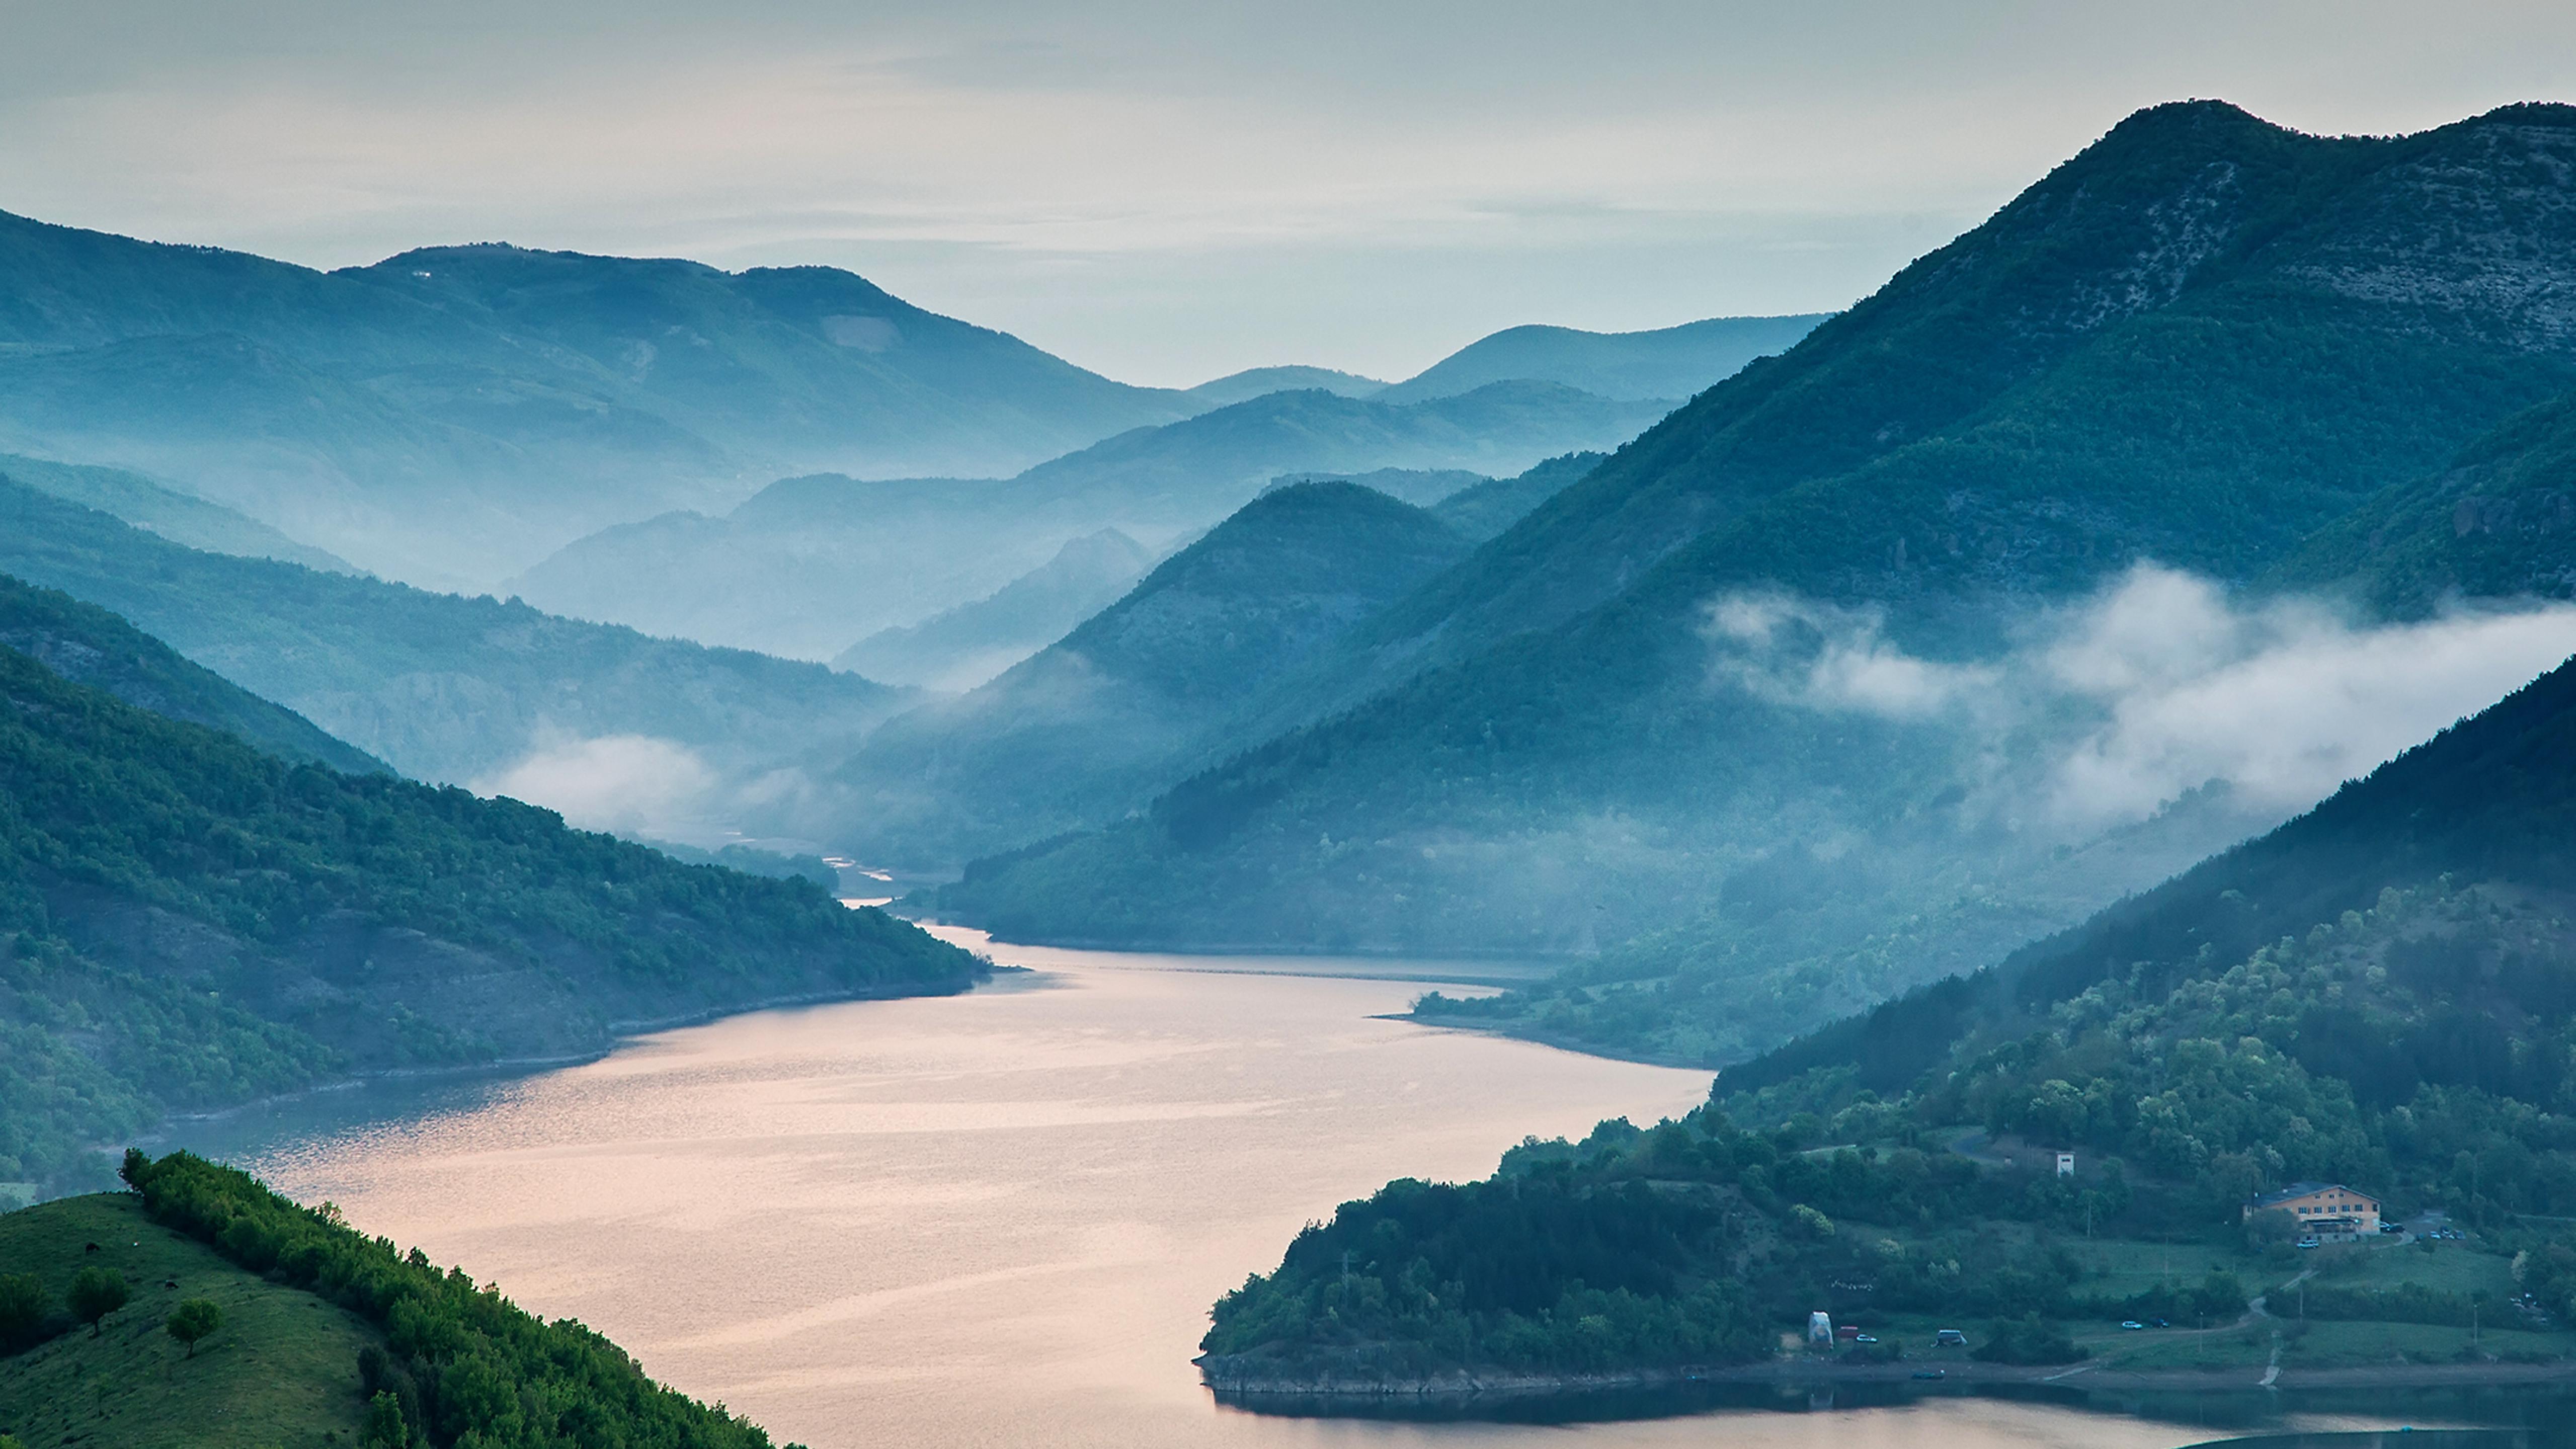 A Beautiful Landscape Of Nature Hd Wallpaper Wallpaper Download 5120x2880